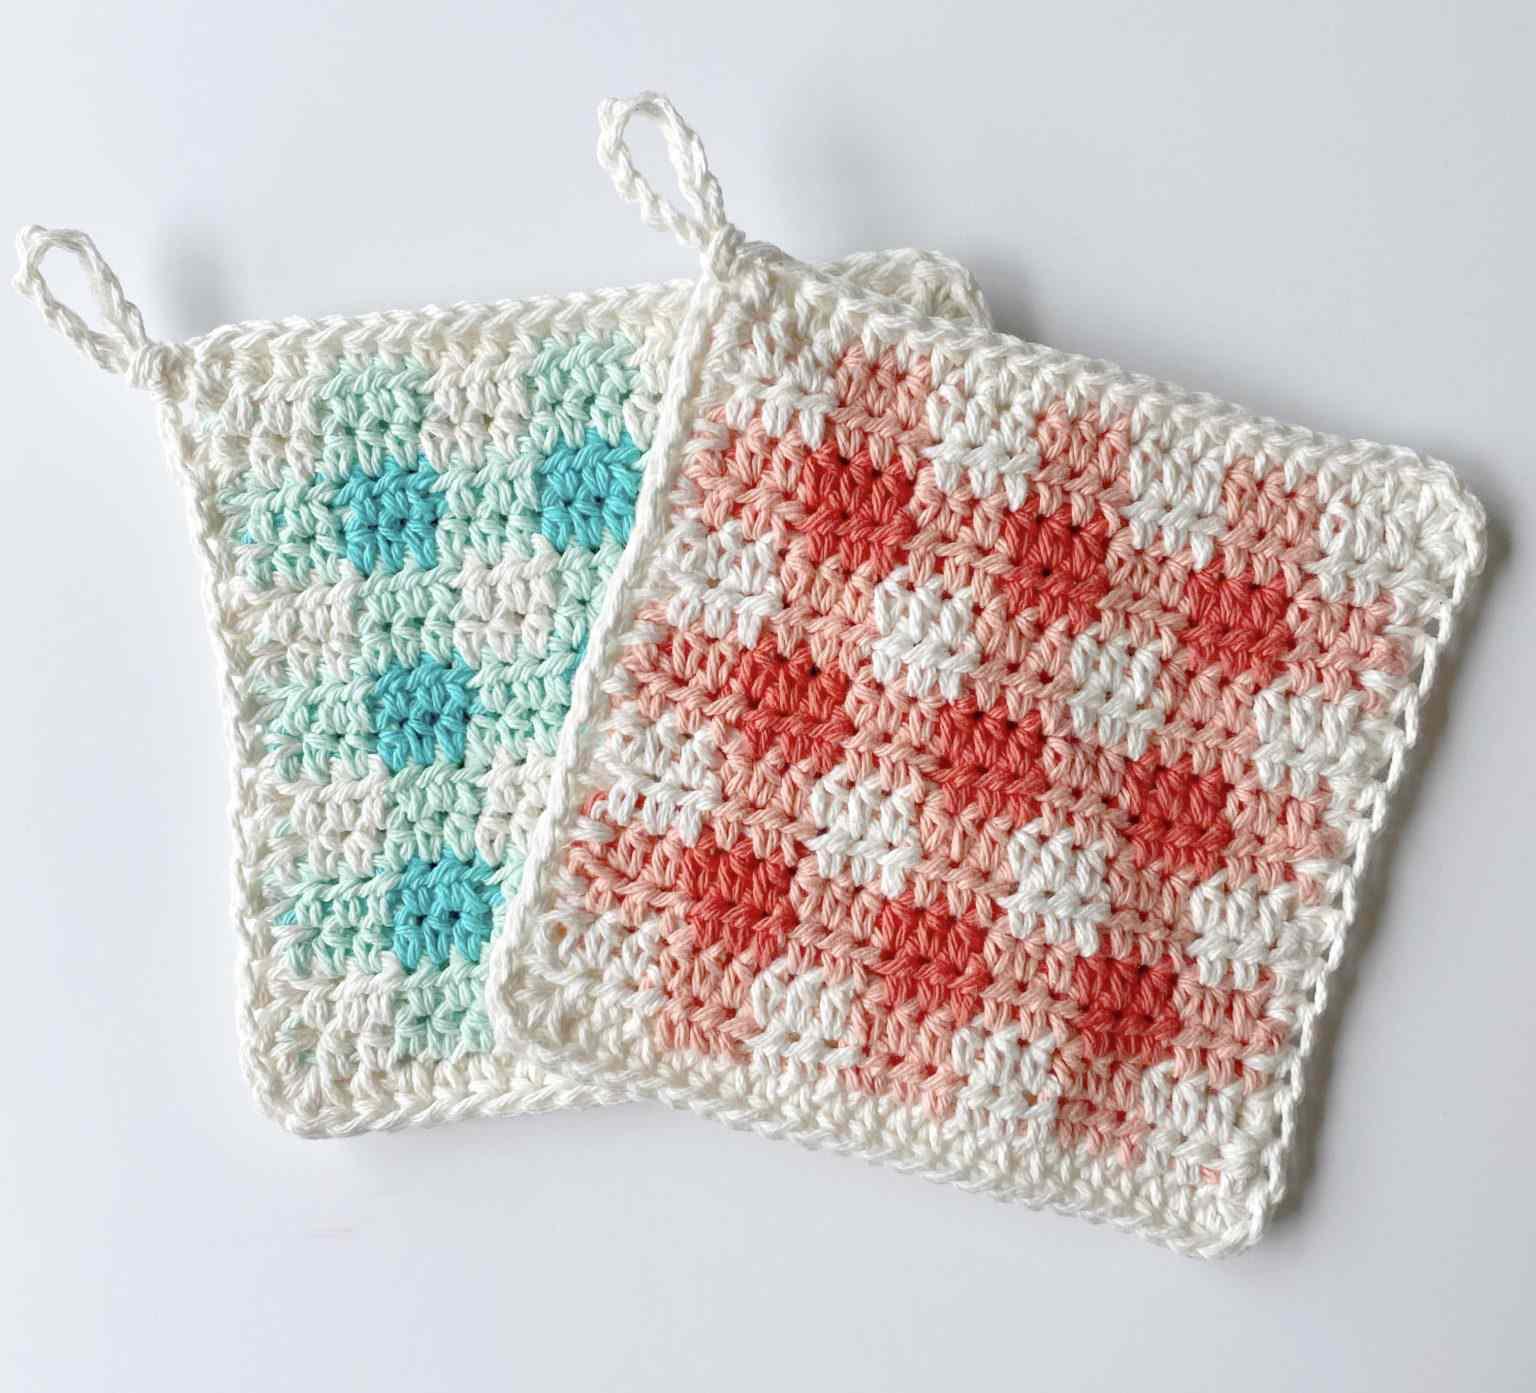 Crochet Picnic Gingham Hot Pad Pattern